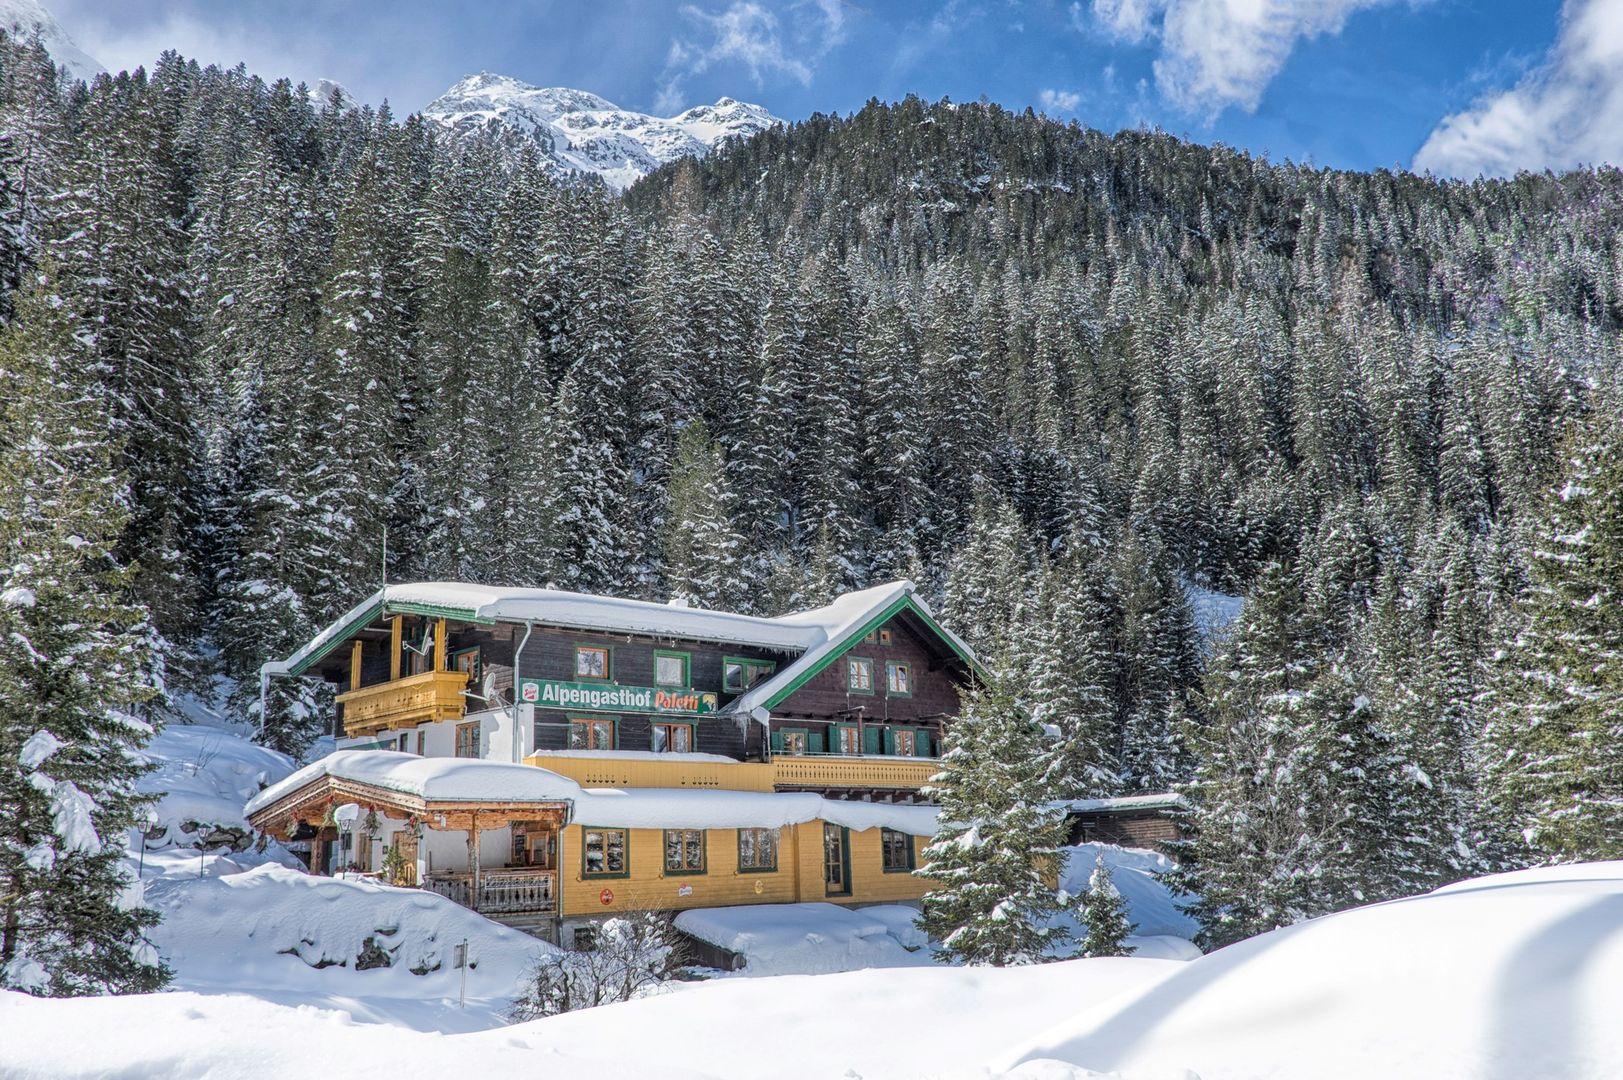 Appartement de vacances Doppelzimmer Du/WC, HP PLUS, Alpengasthof Paletti (1983282), Uttendorf, Pinzgau, Salzbourg, Autriche, image 1